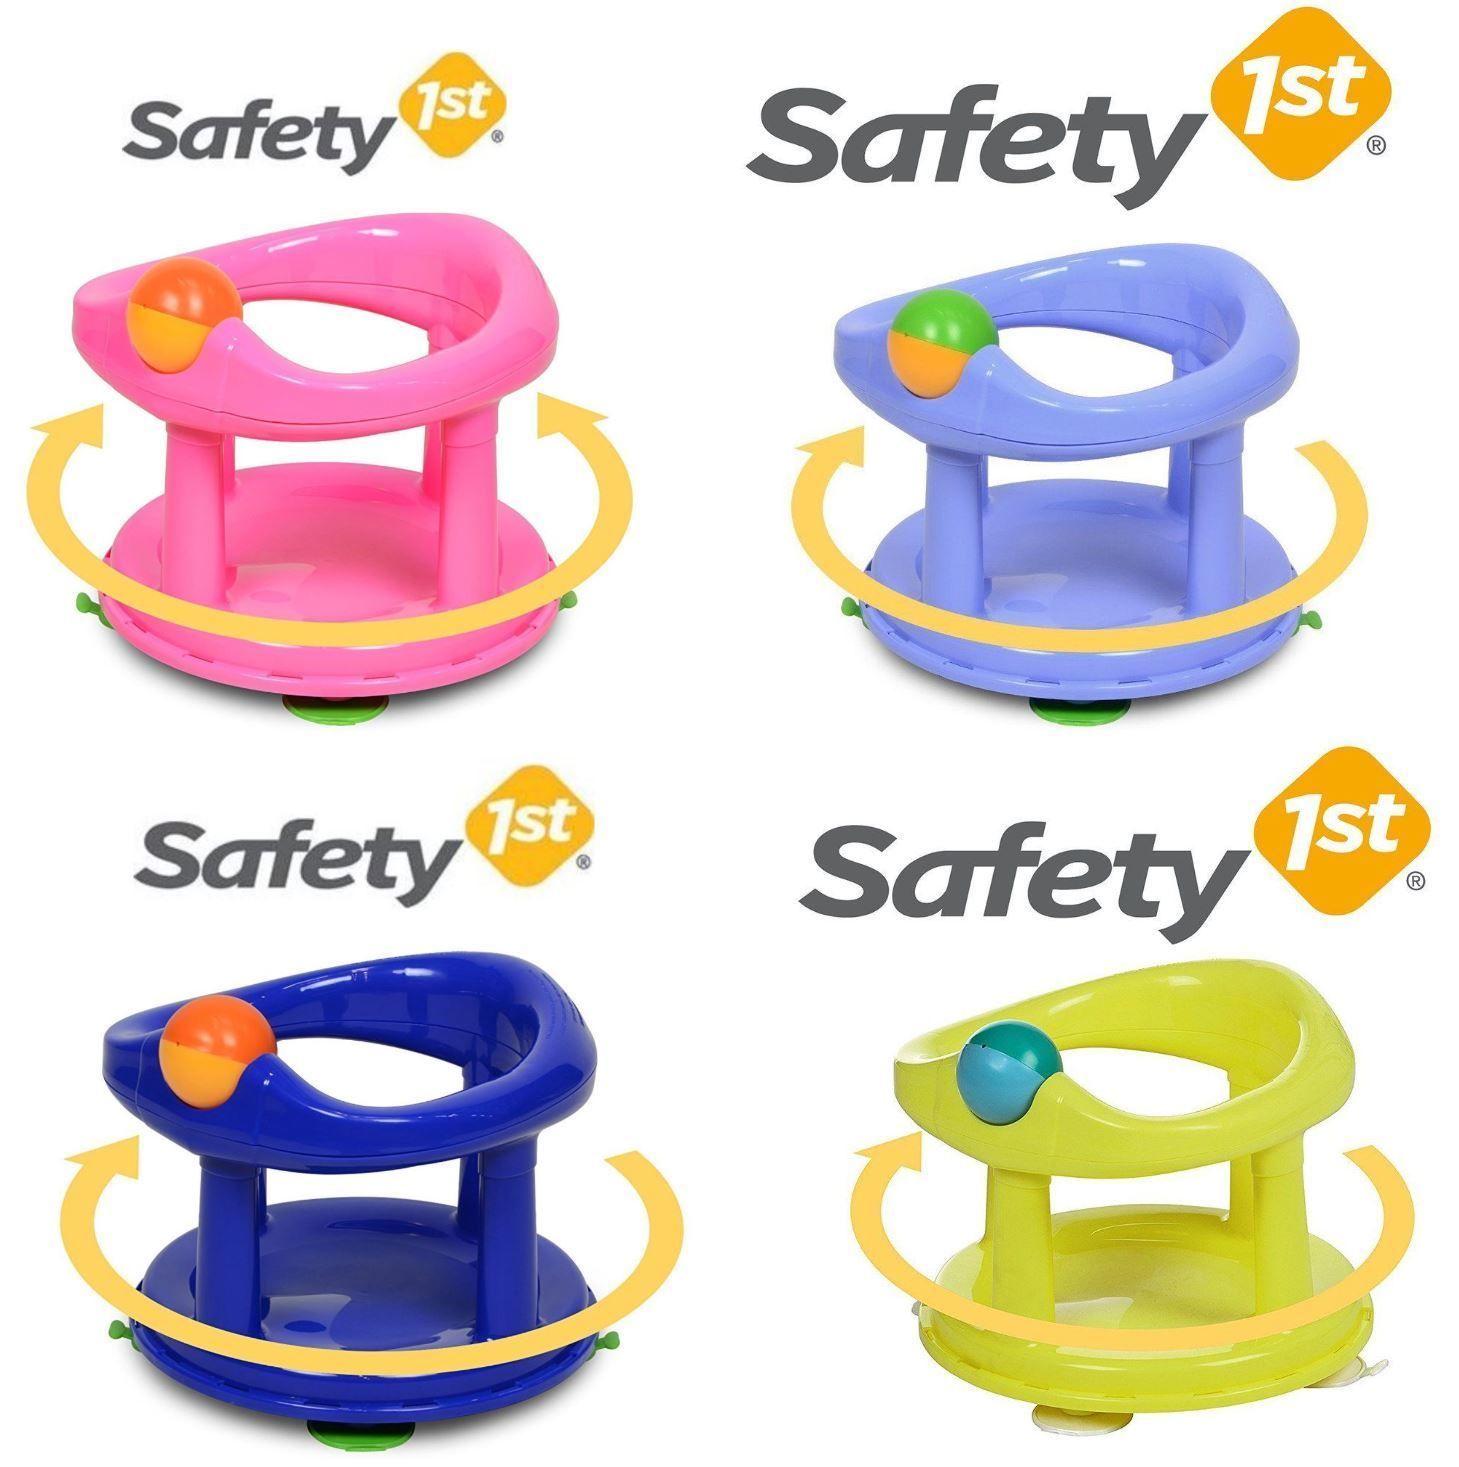 Bathing Accessories 100221: Safety First Swivel Baby Bath Tub ...